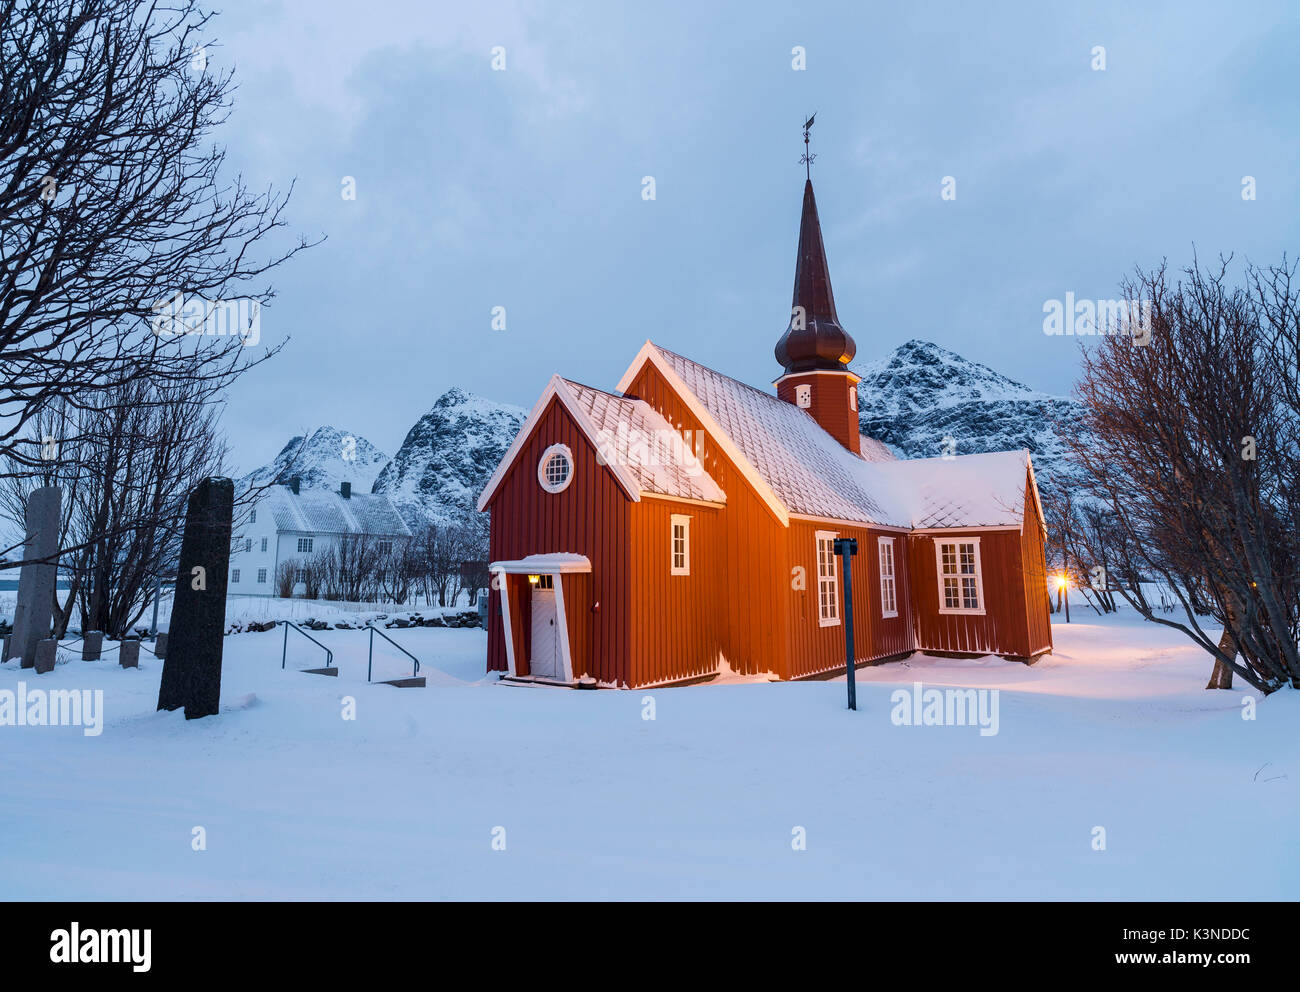 The Flakstad Church in snow, Lofoten Islands, Norway - Stock Image